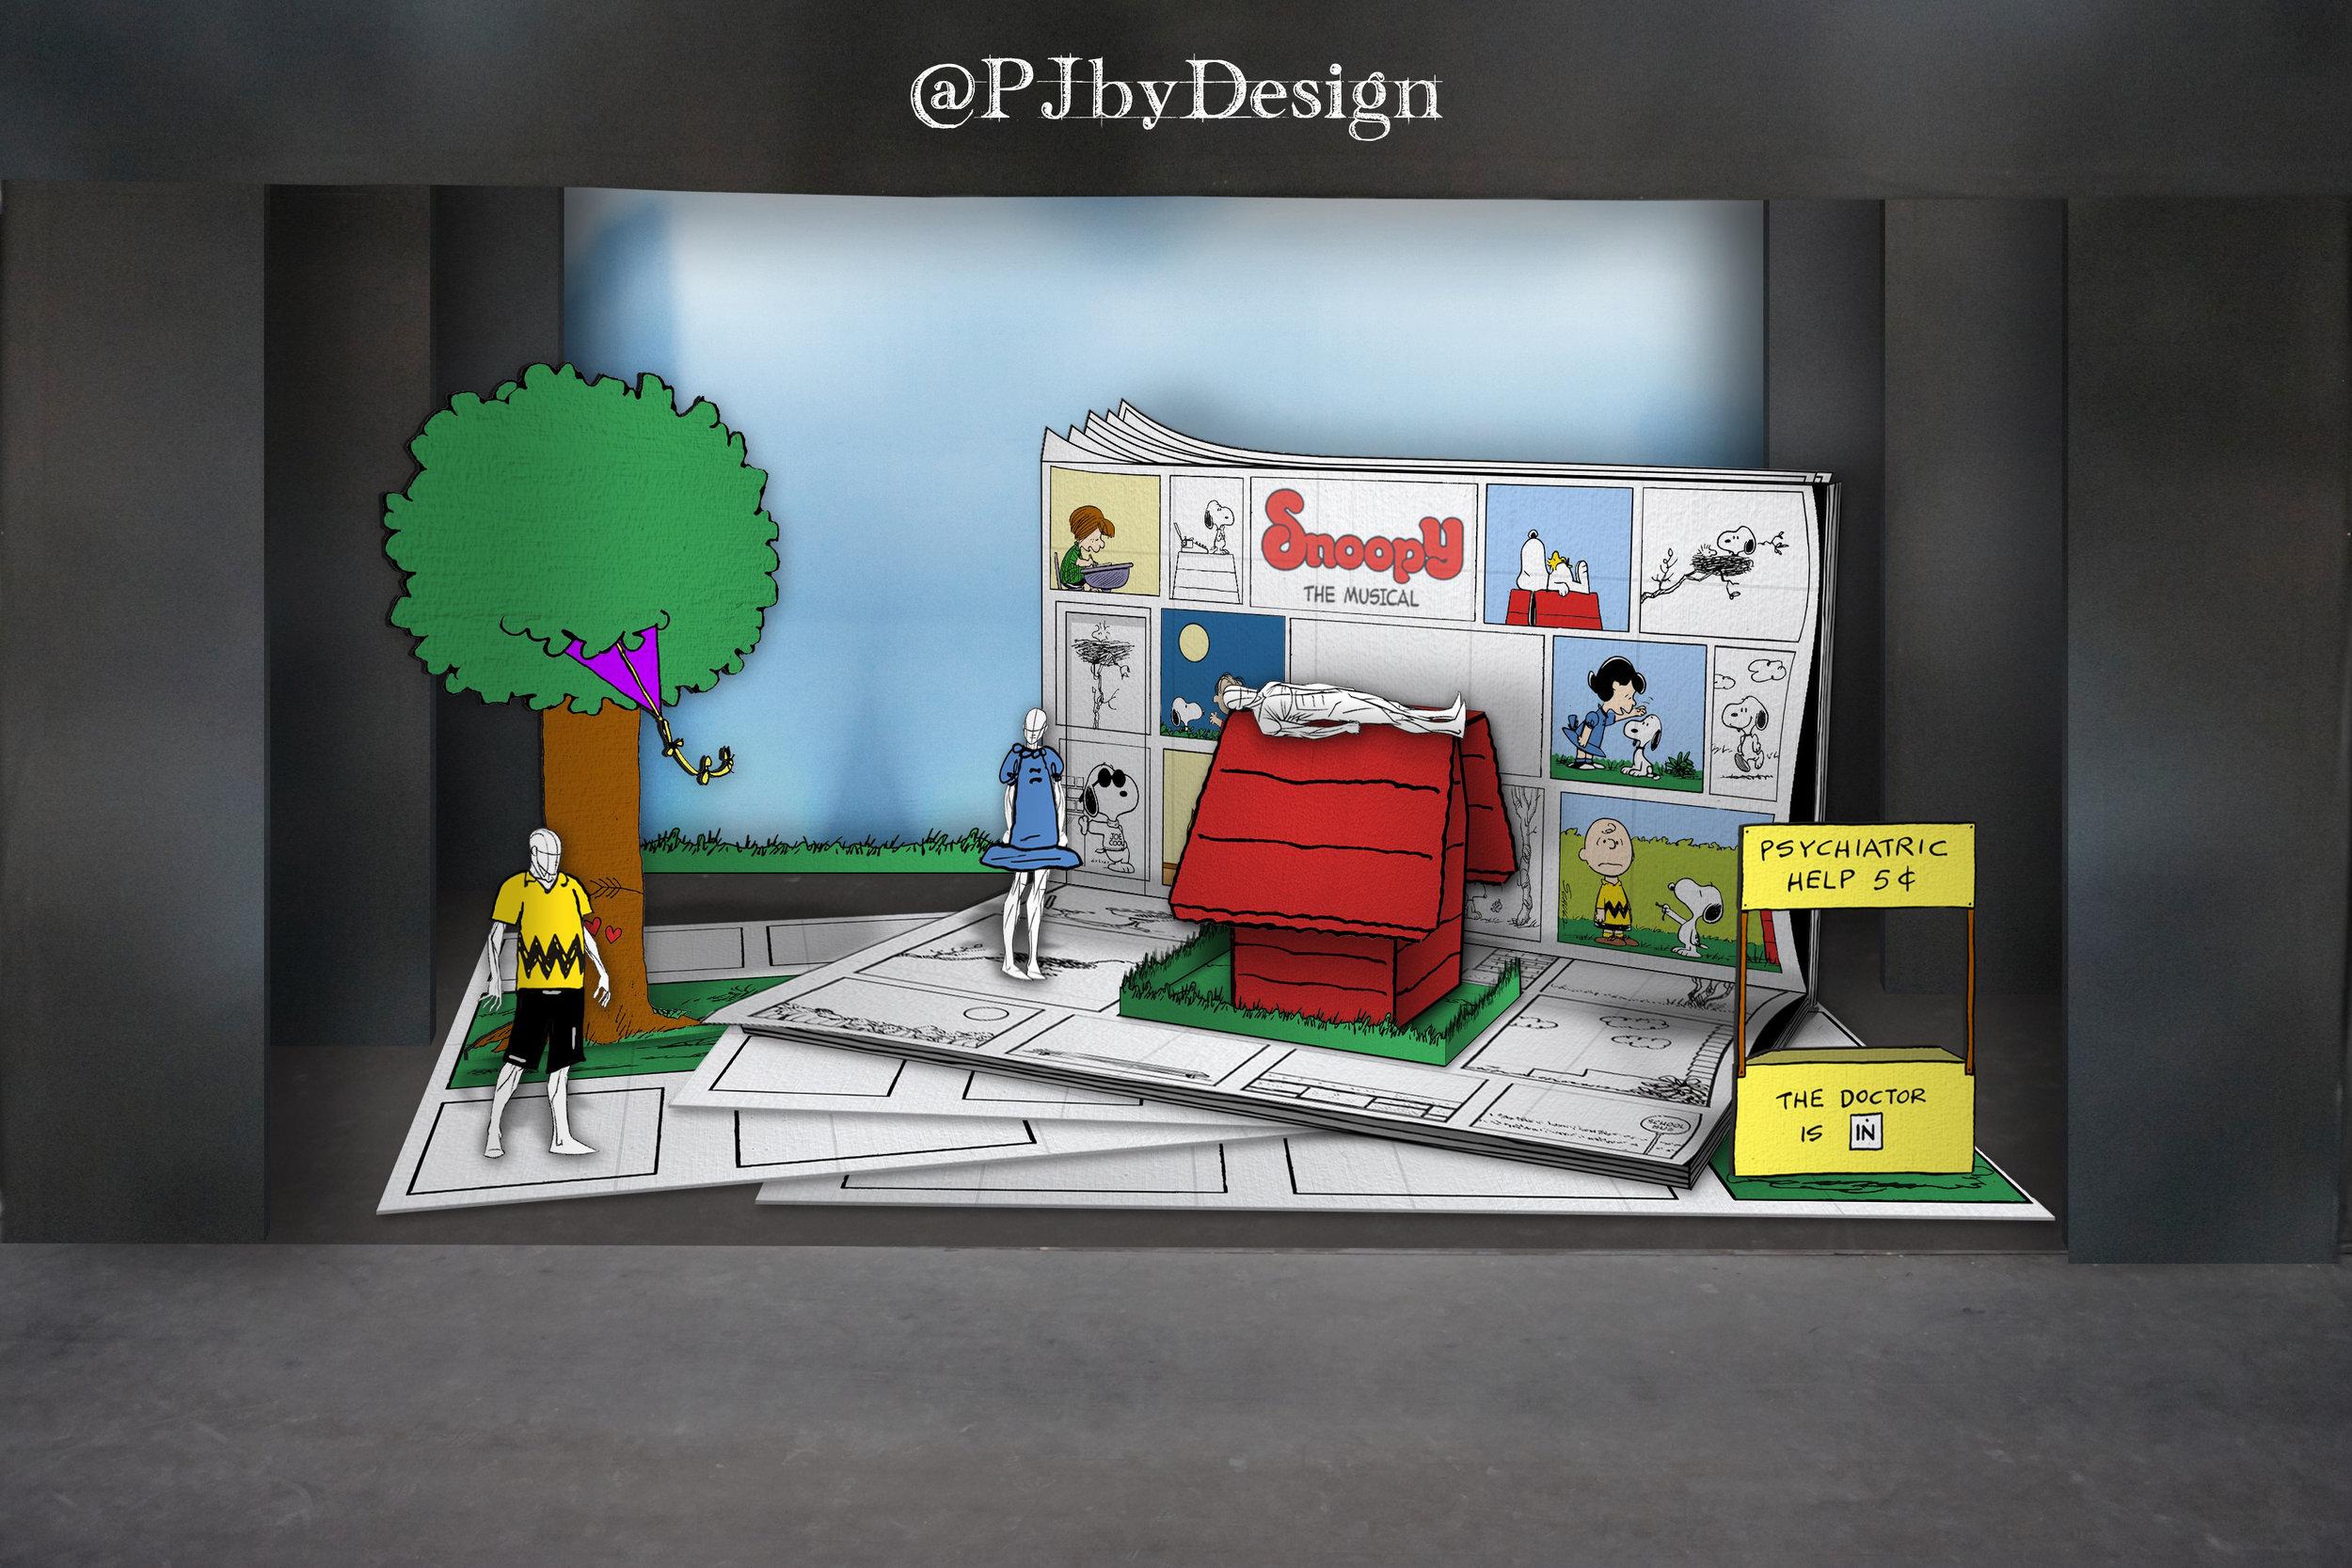 Snoopy Design.jpg